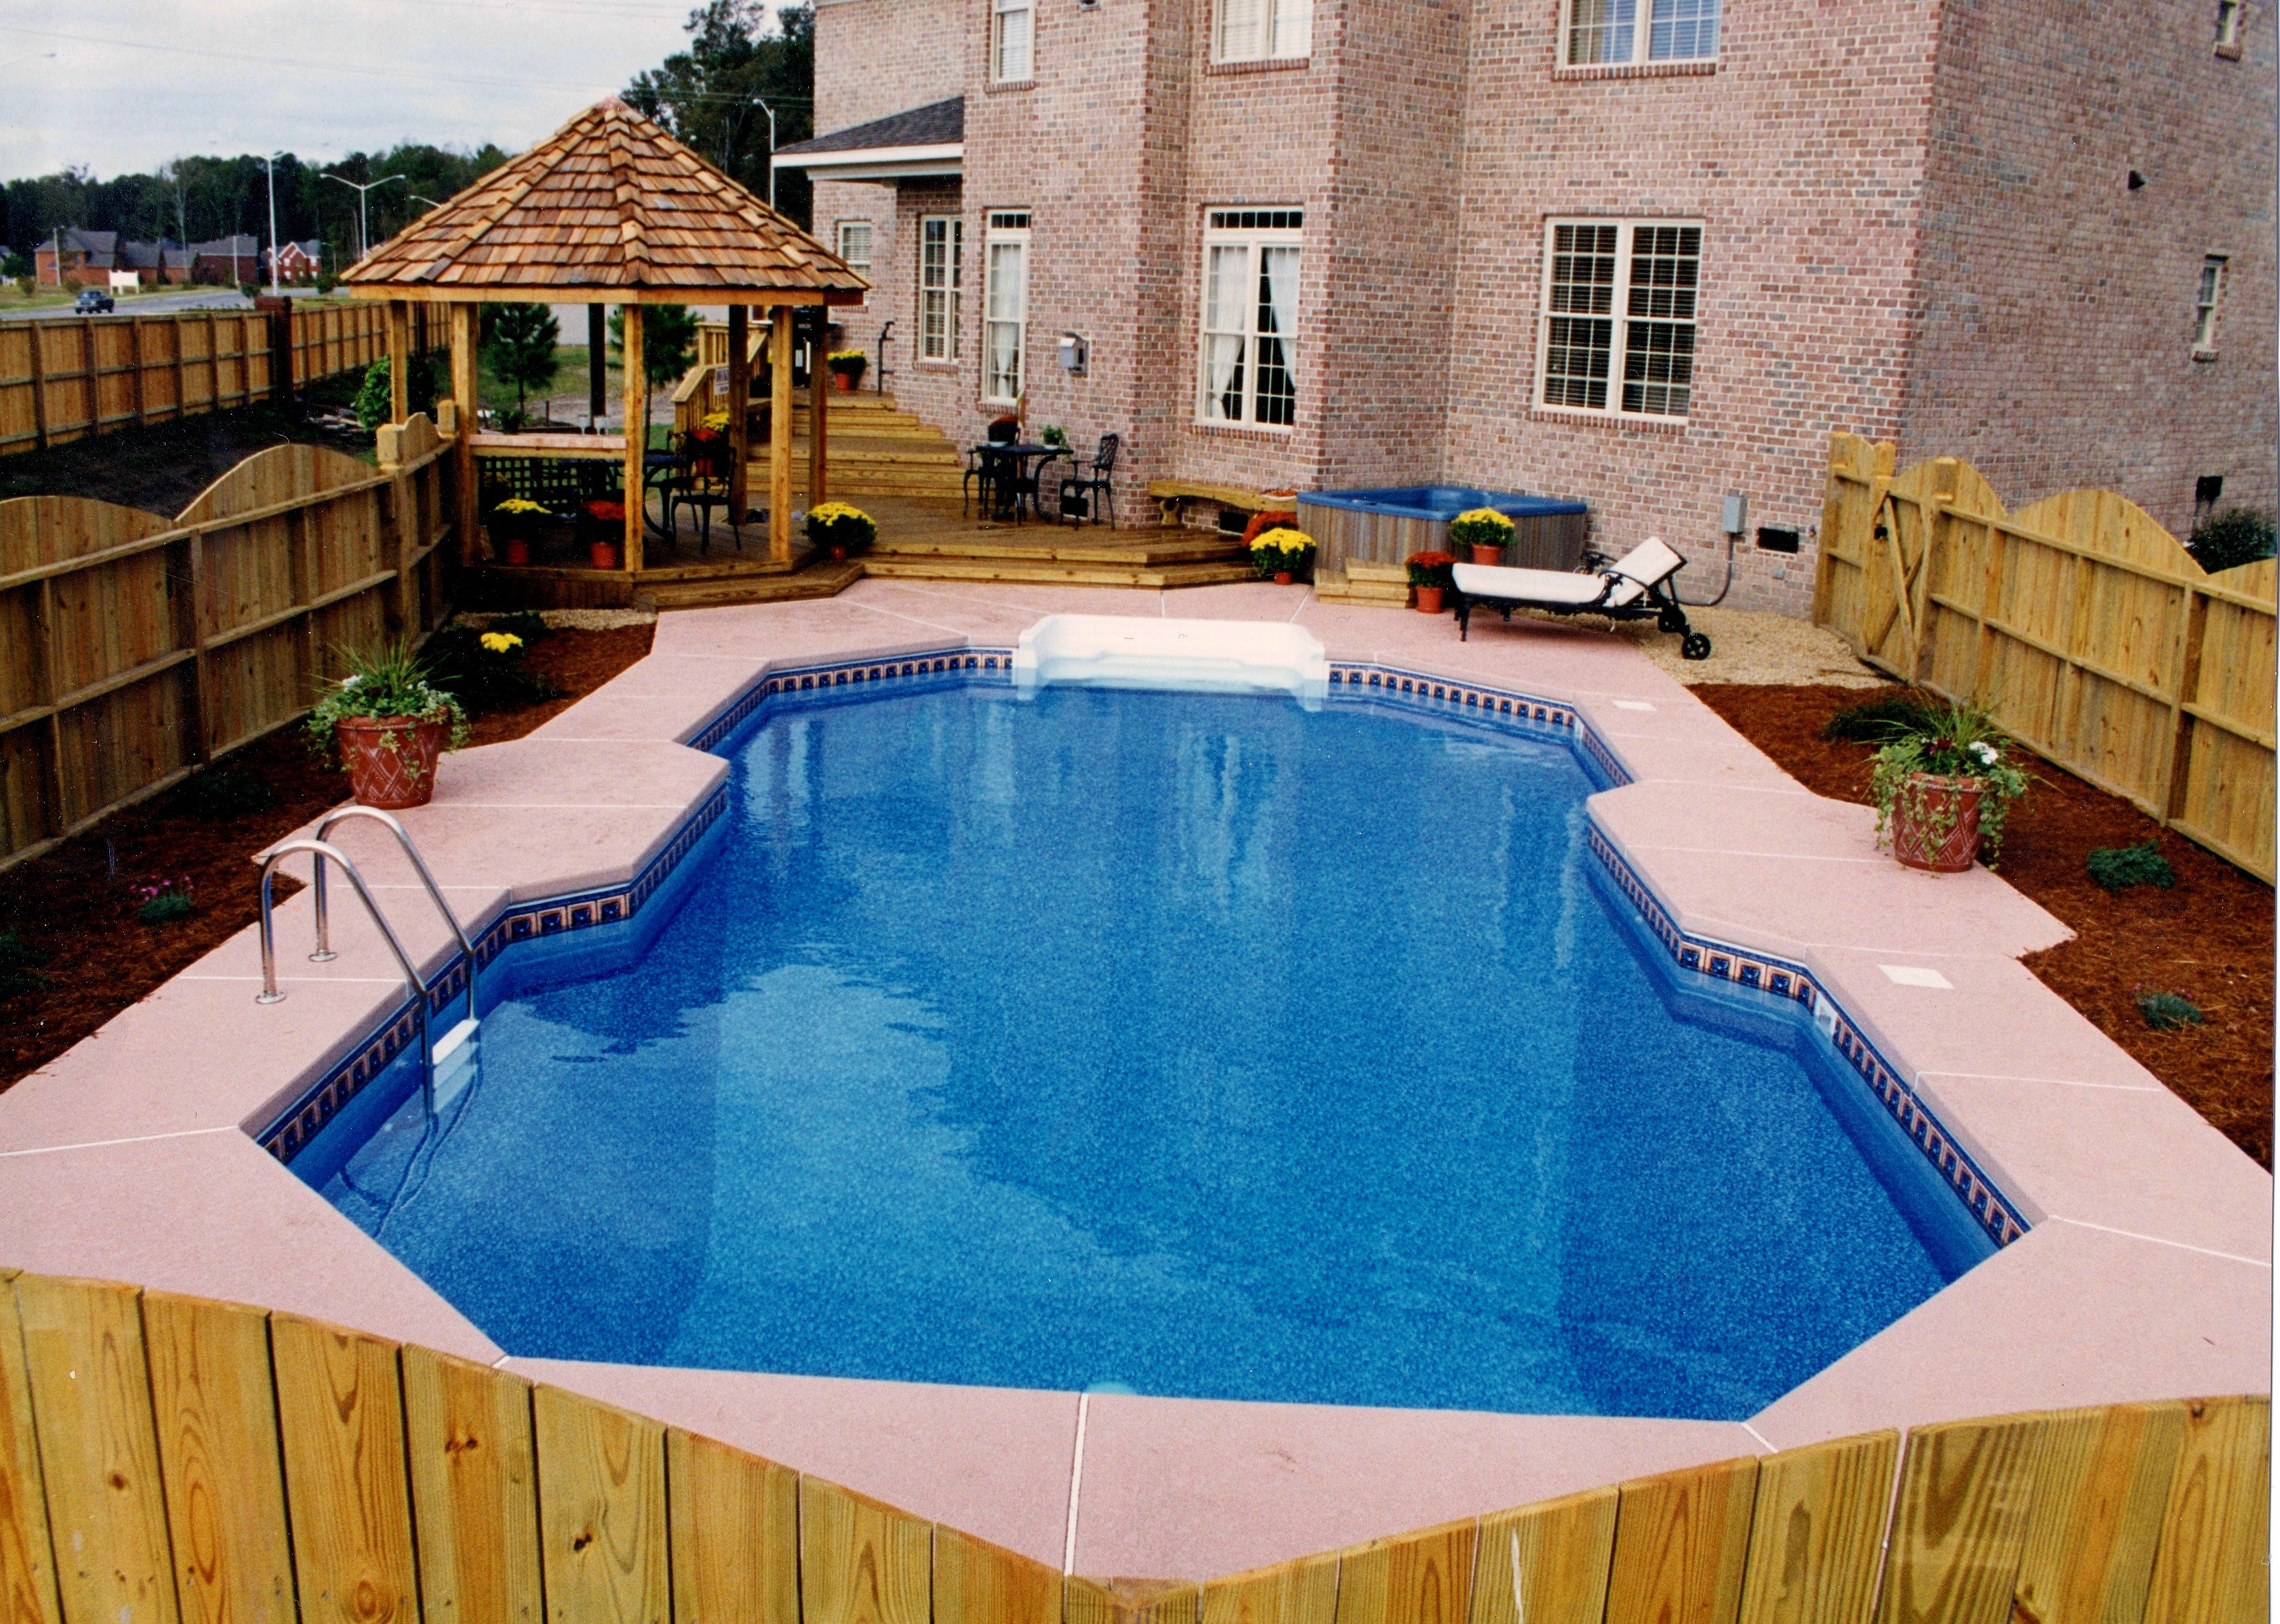 Classic liner pool 3